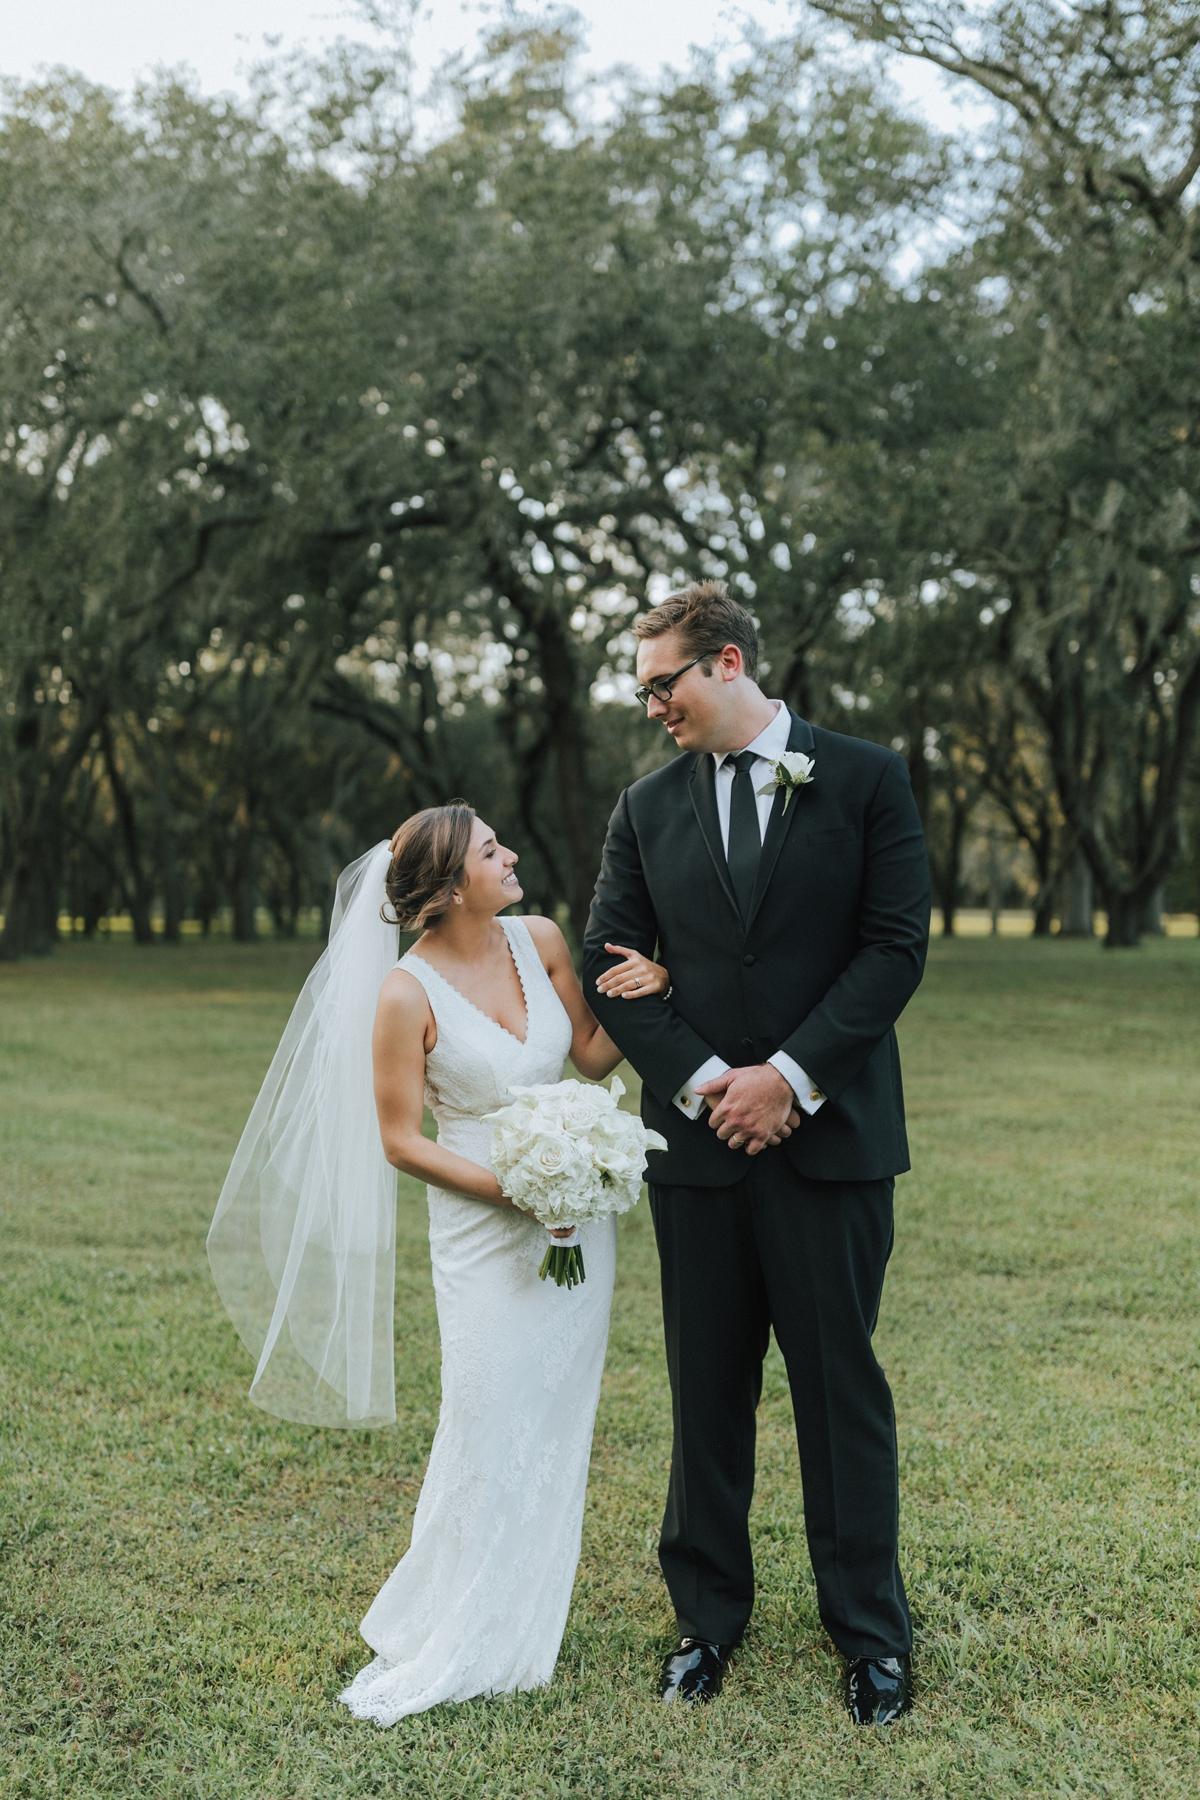 Tampa Area Florida Wedding Venue, Stonebridge at The Lange Farm_0131.jpg